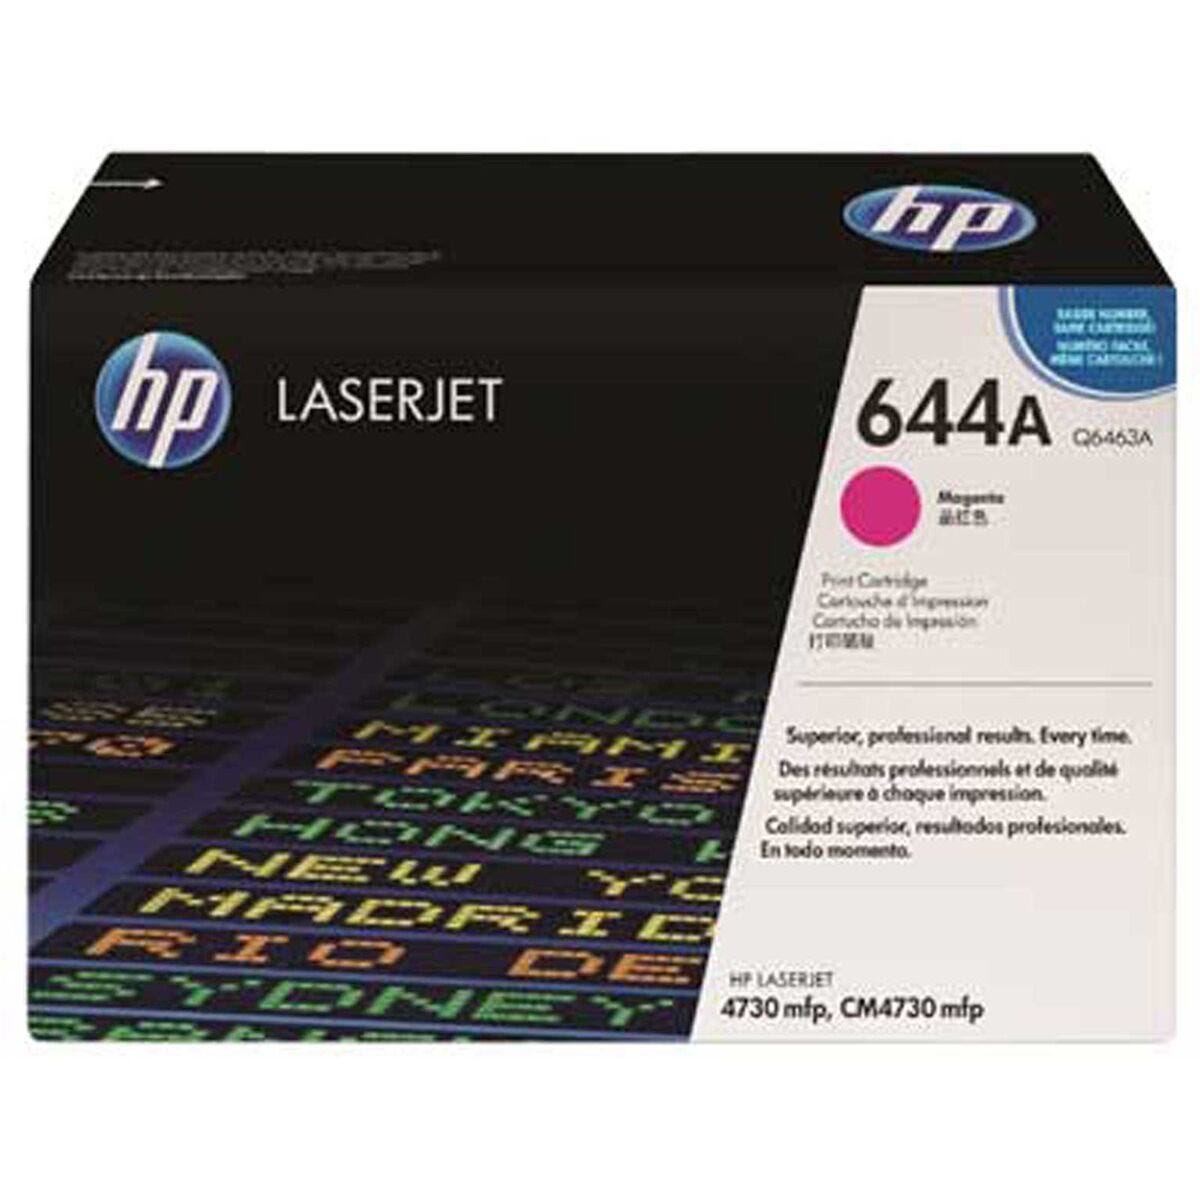 HP Q6463A Colour Laser Printer Ink Toner Cartridge